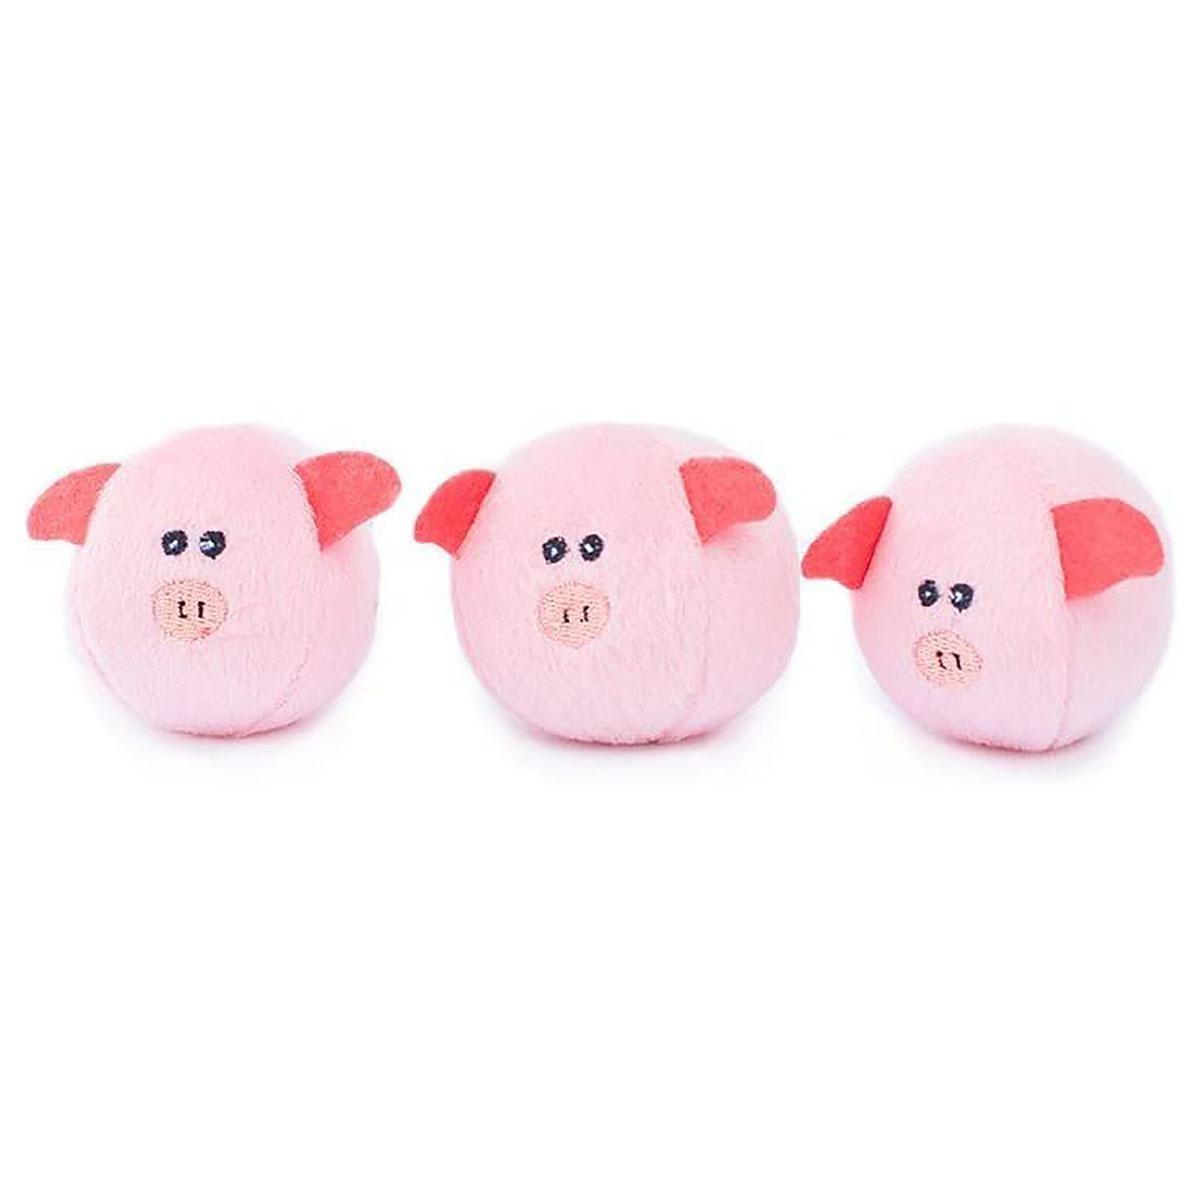 ZippyPaws Miniz Dog Toys - Bubble Pigs